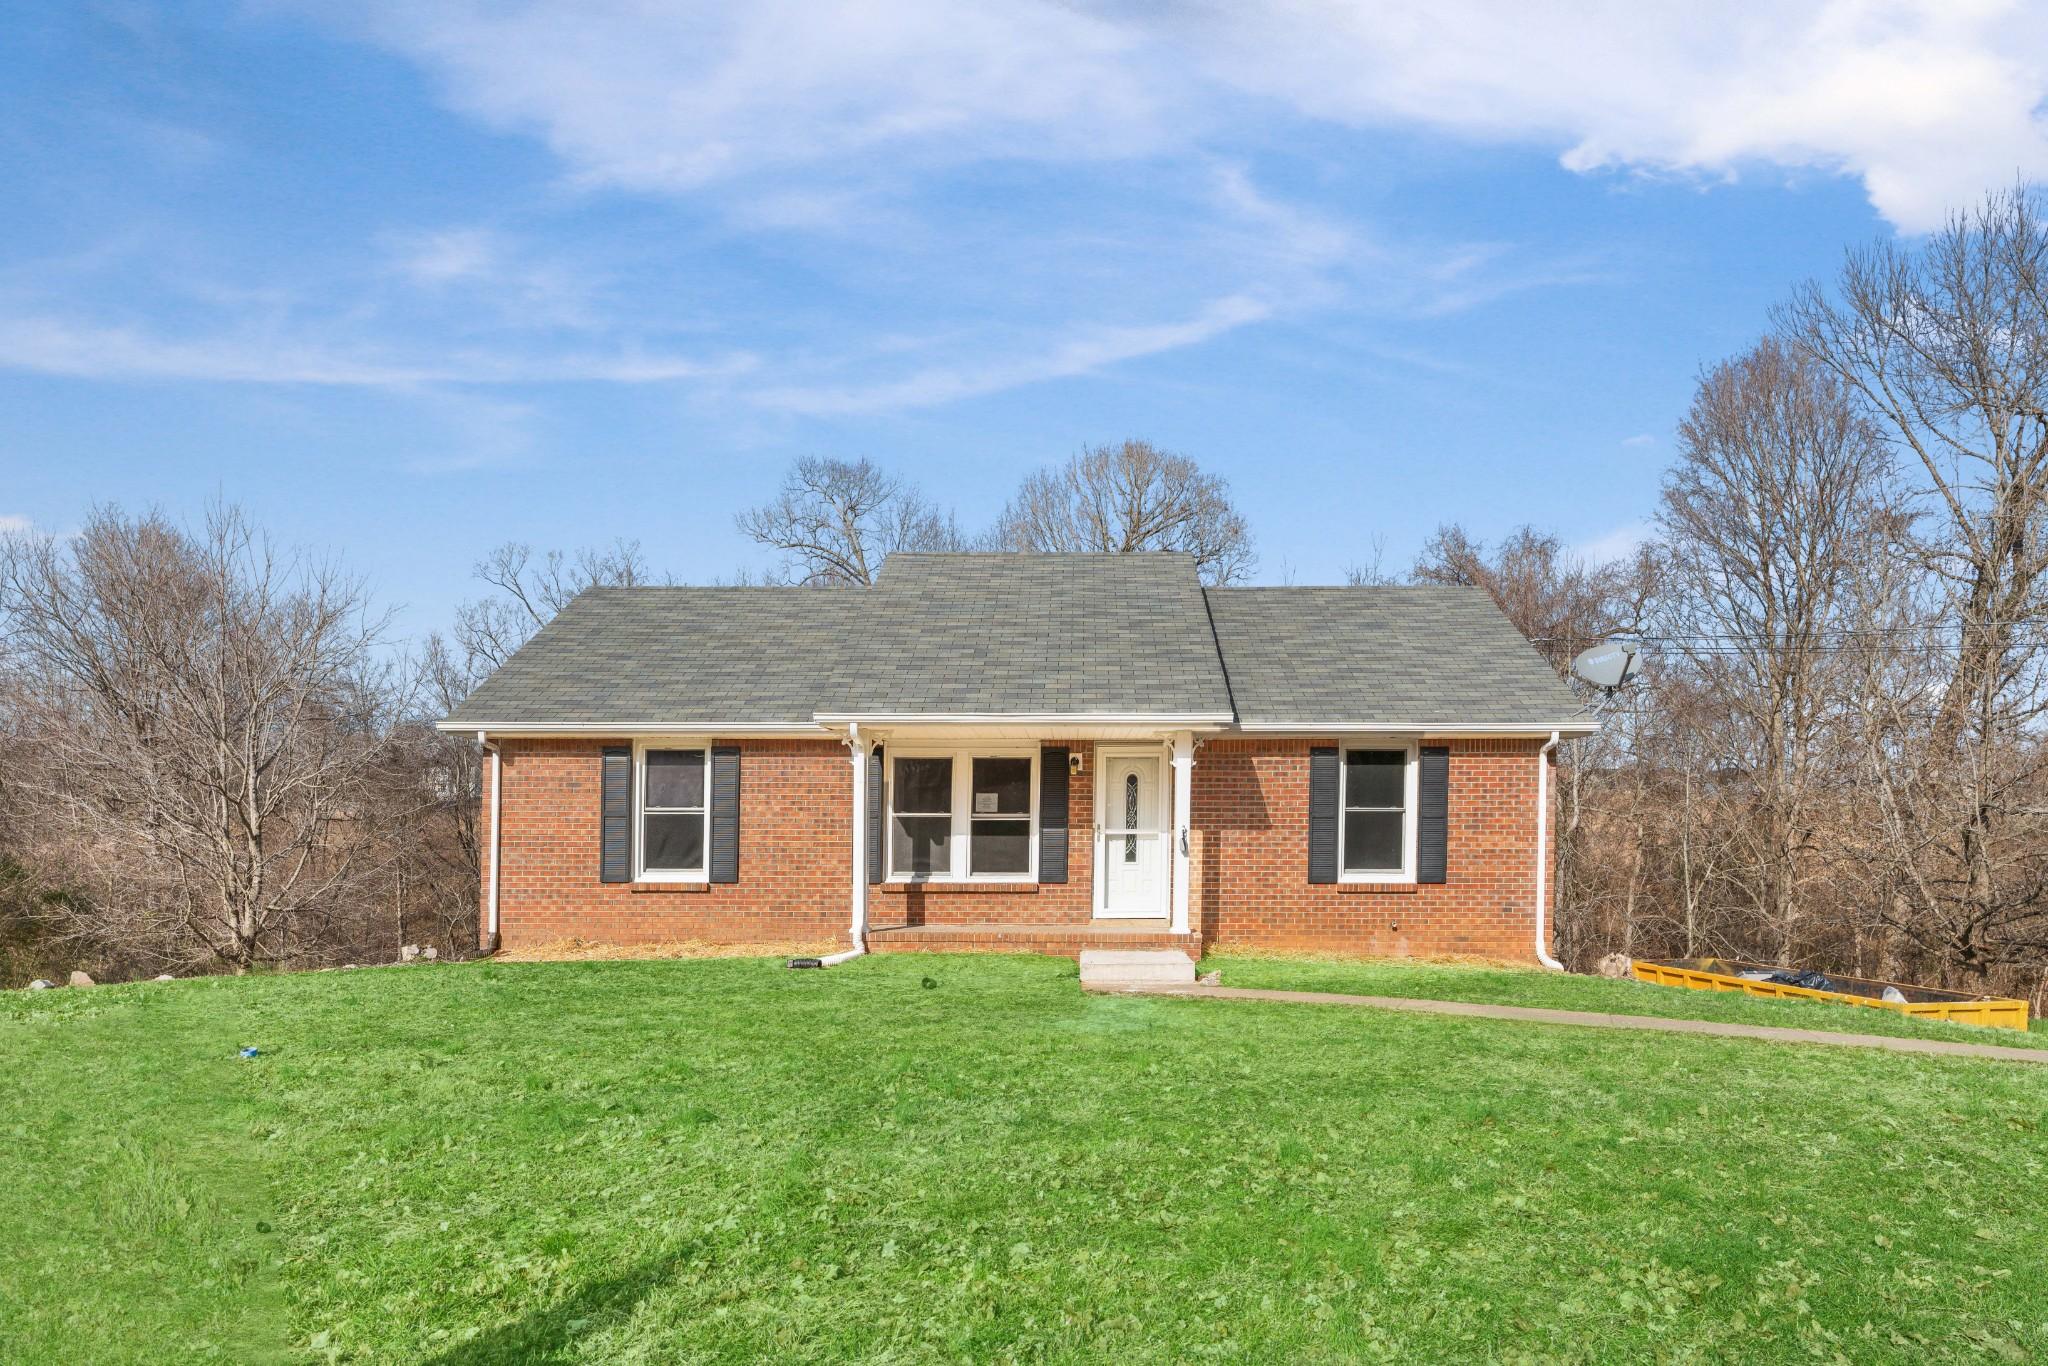 567 Briarwood Dr, Clarksville, TN 37040 - Clarksville, TN real estate listing